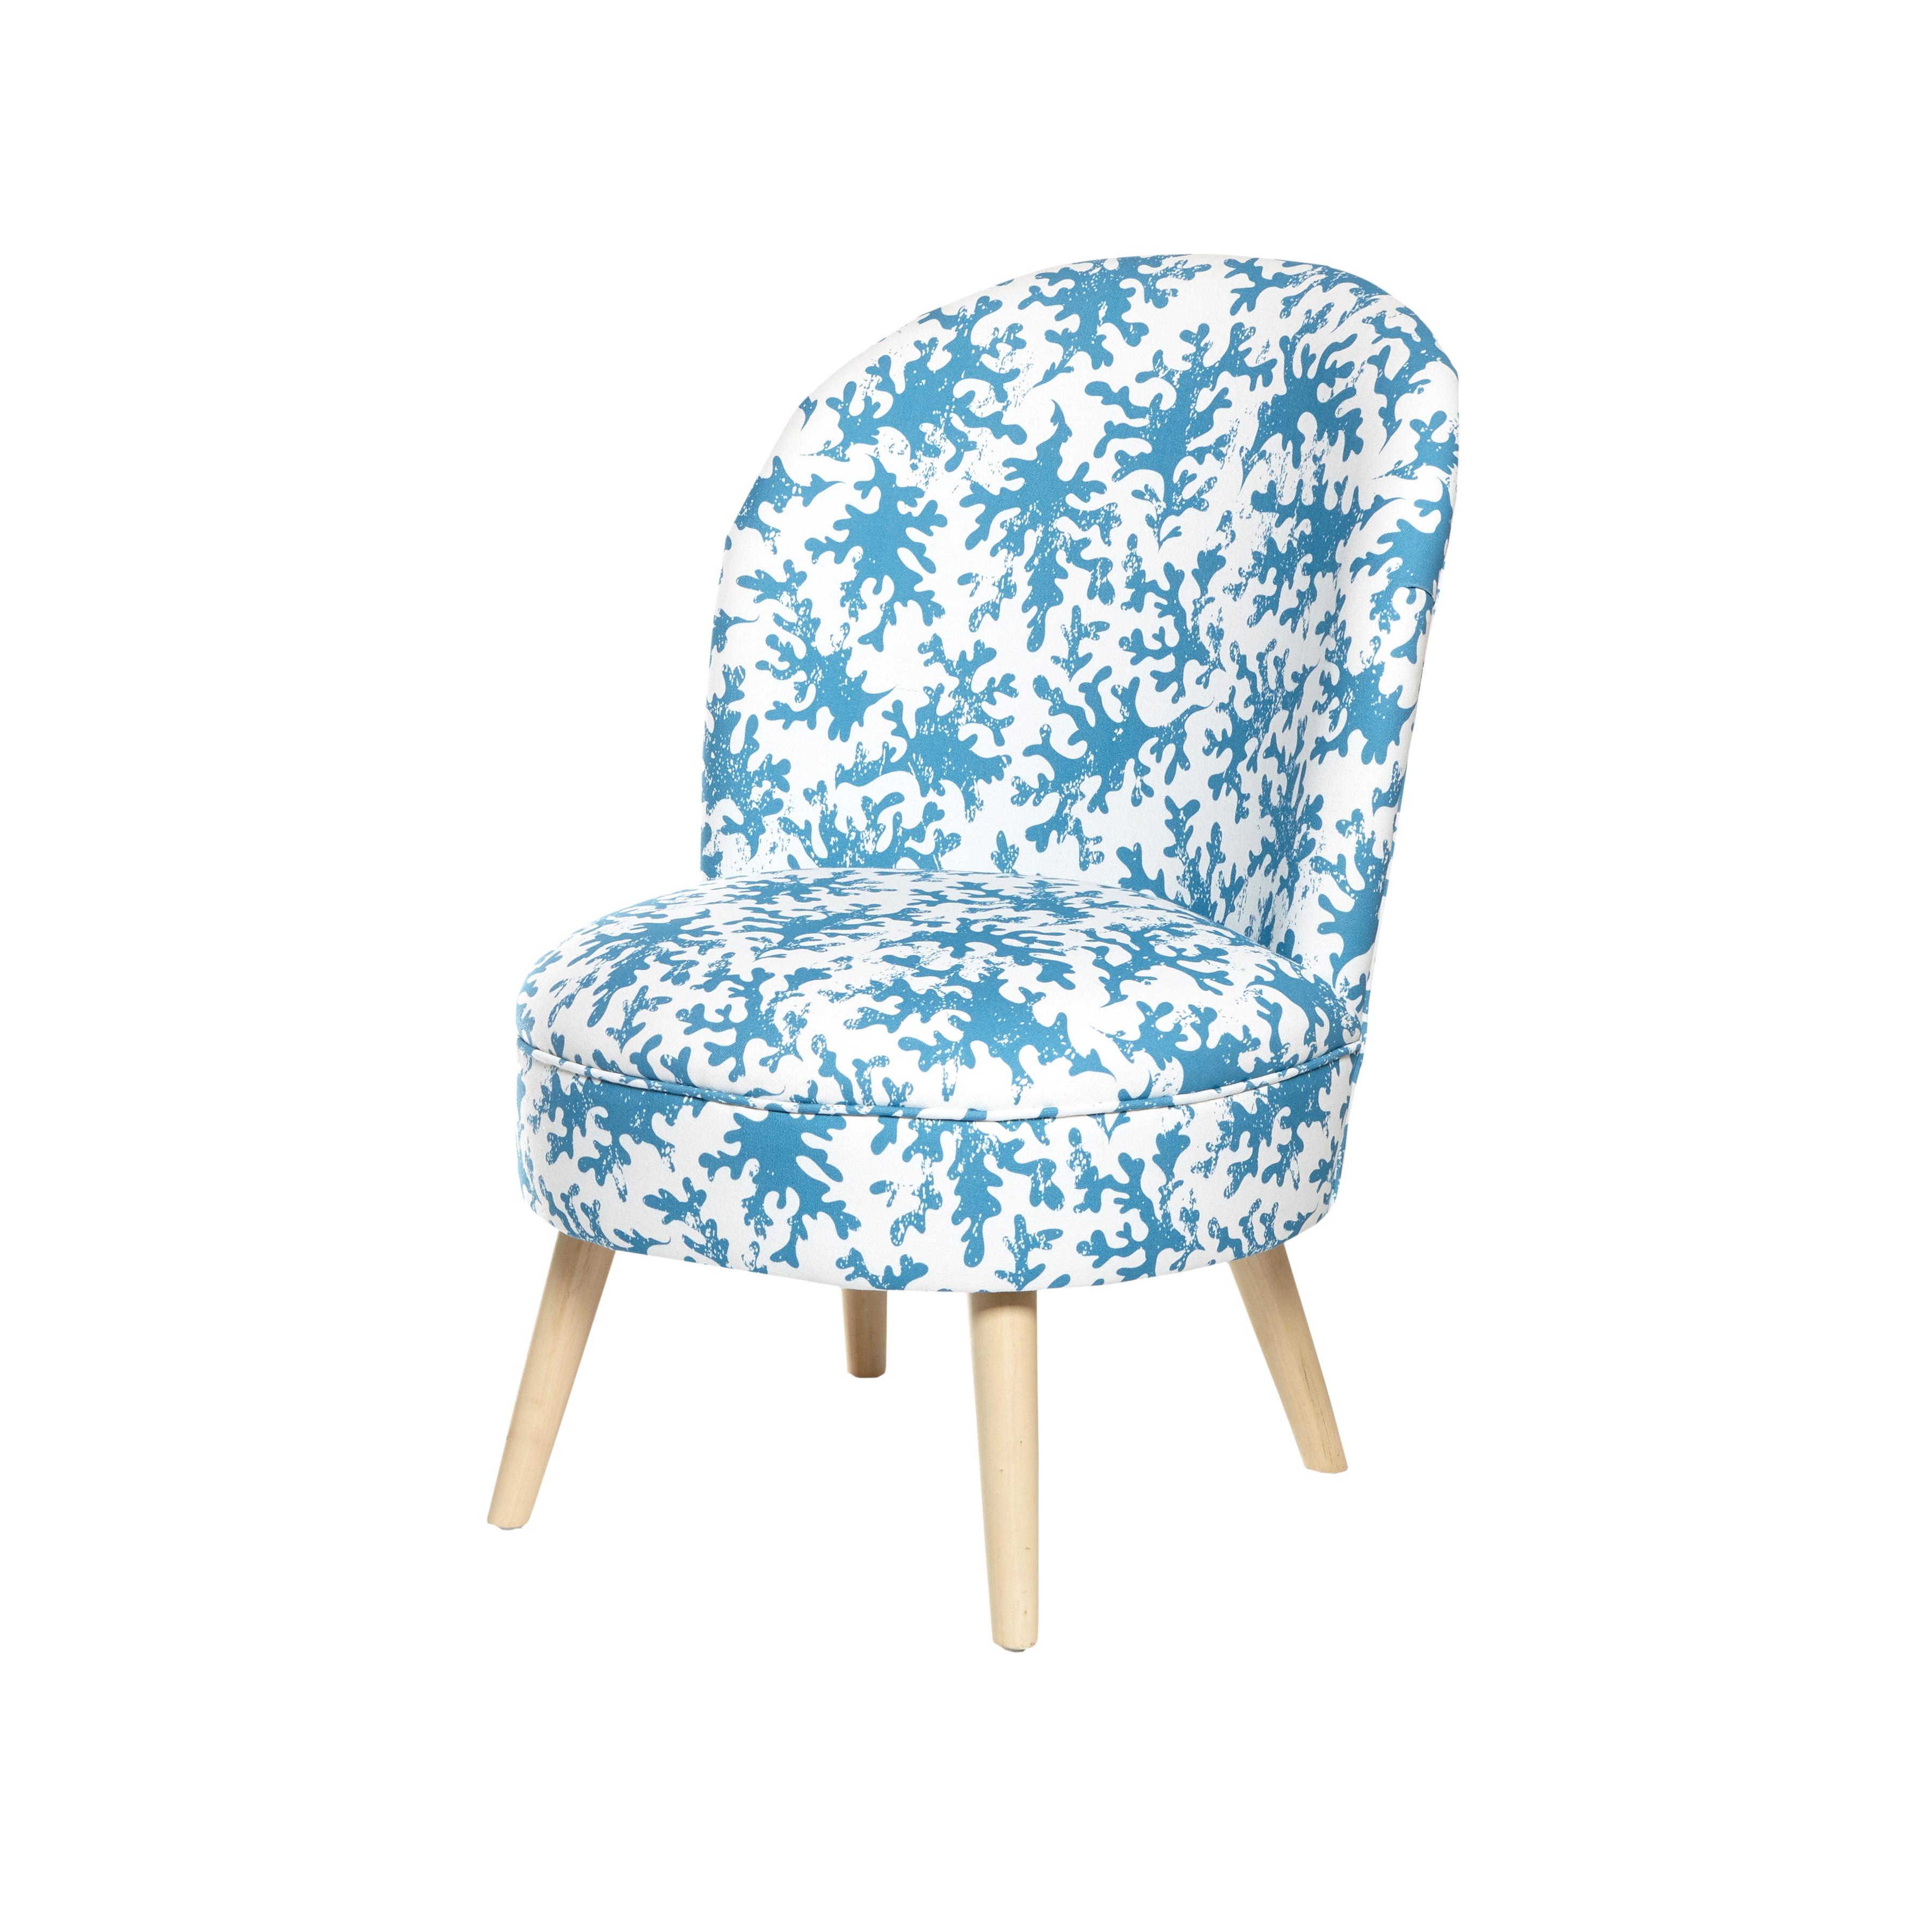 Poltroncina in cotone e legno Blucoral, Bianco/Blu, large image number 0